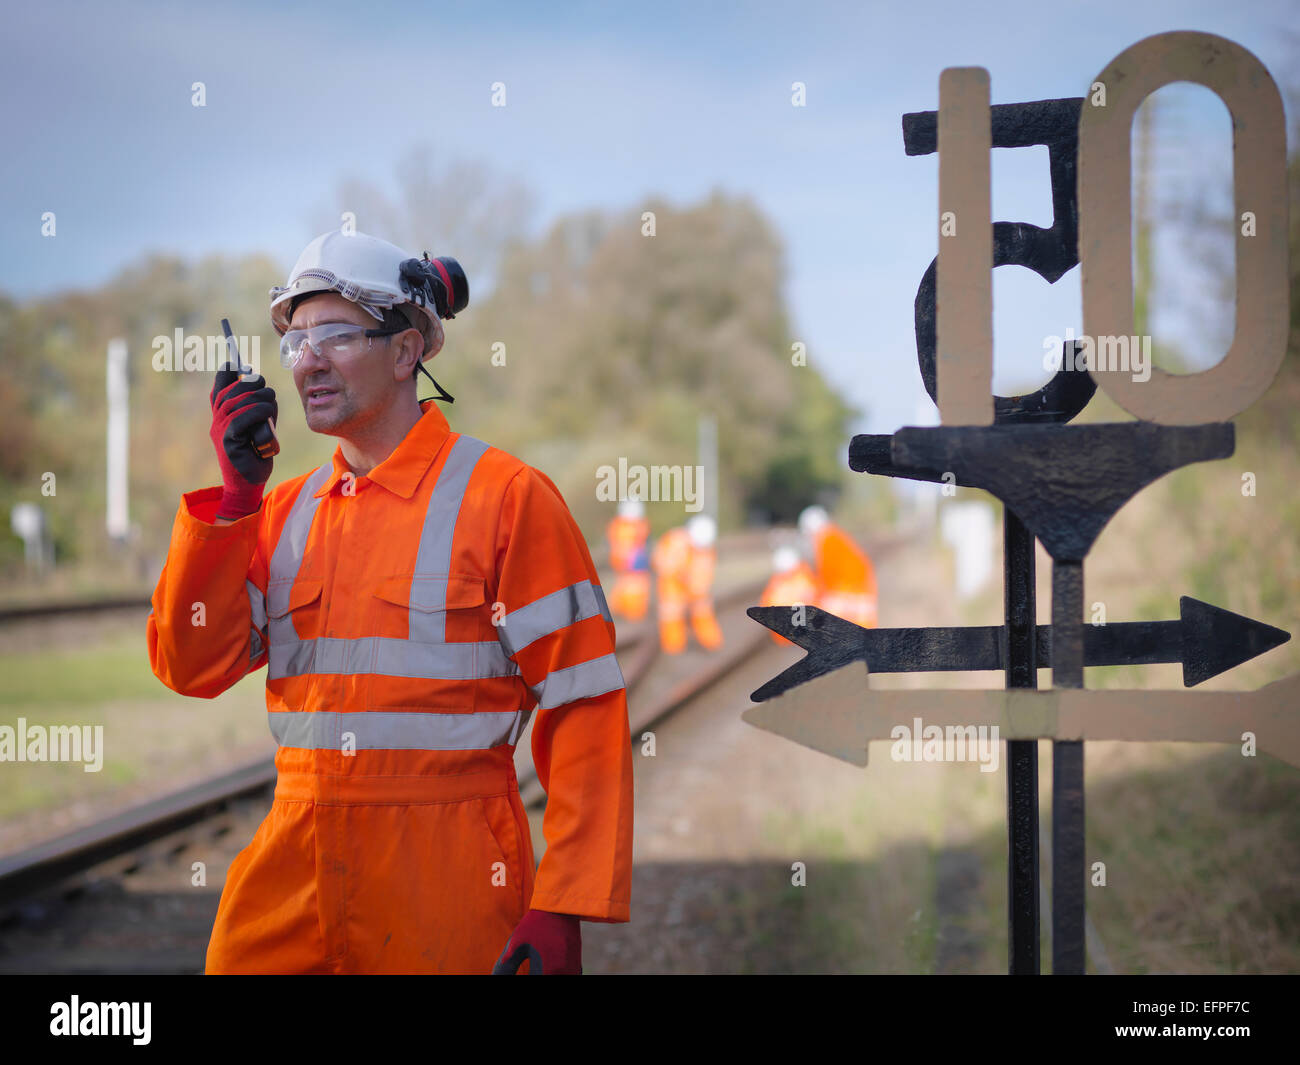 Railway worker using walkie talkie on railway track - Stock Image